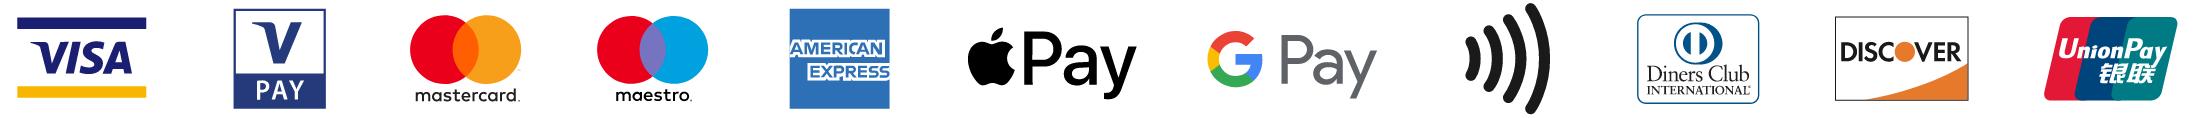 paiement de recherche de fuite en ligne